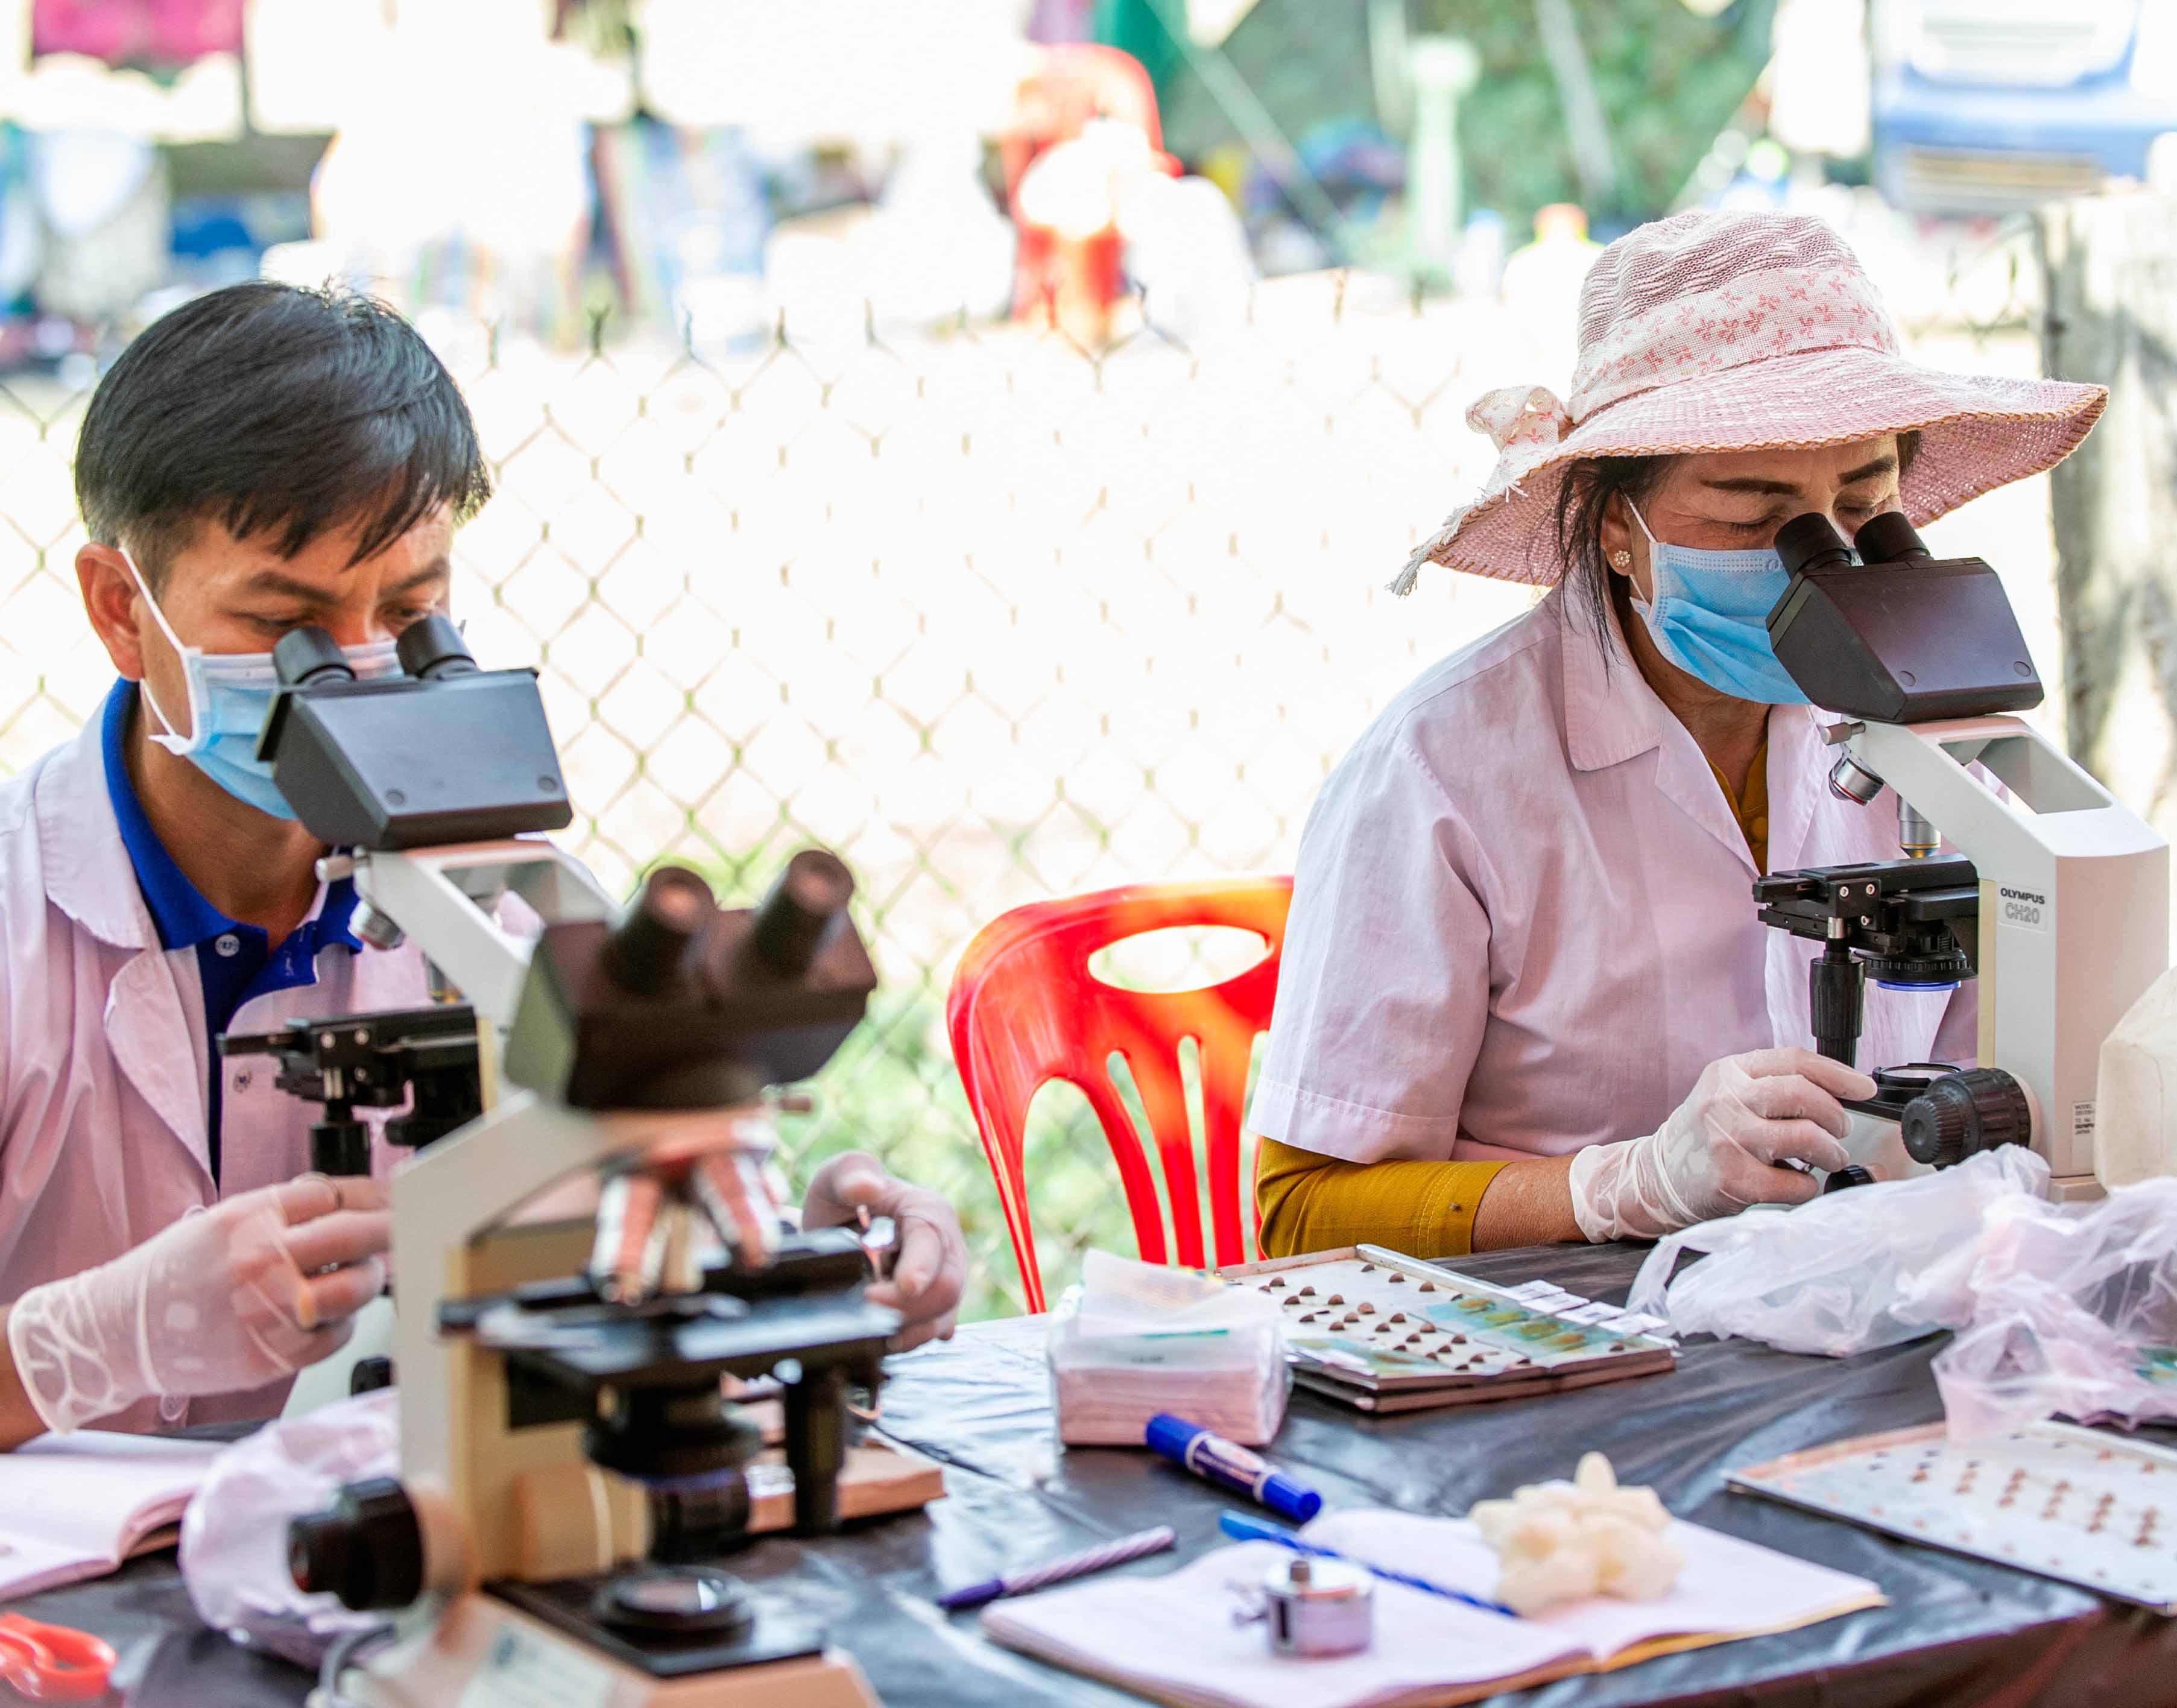 Liver fluke diagnostics in Laos